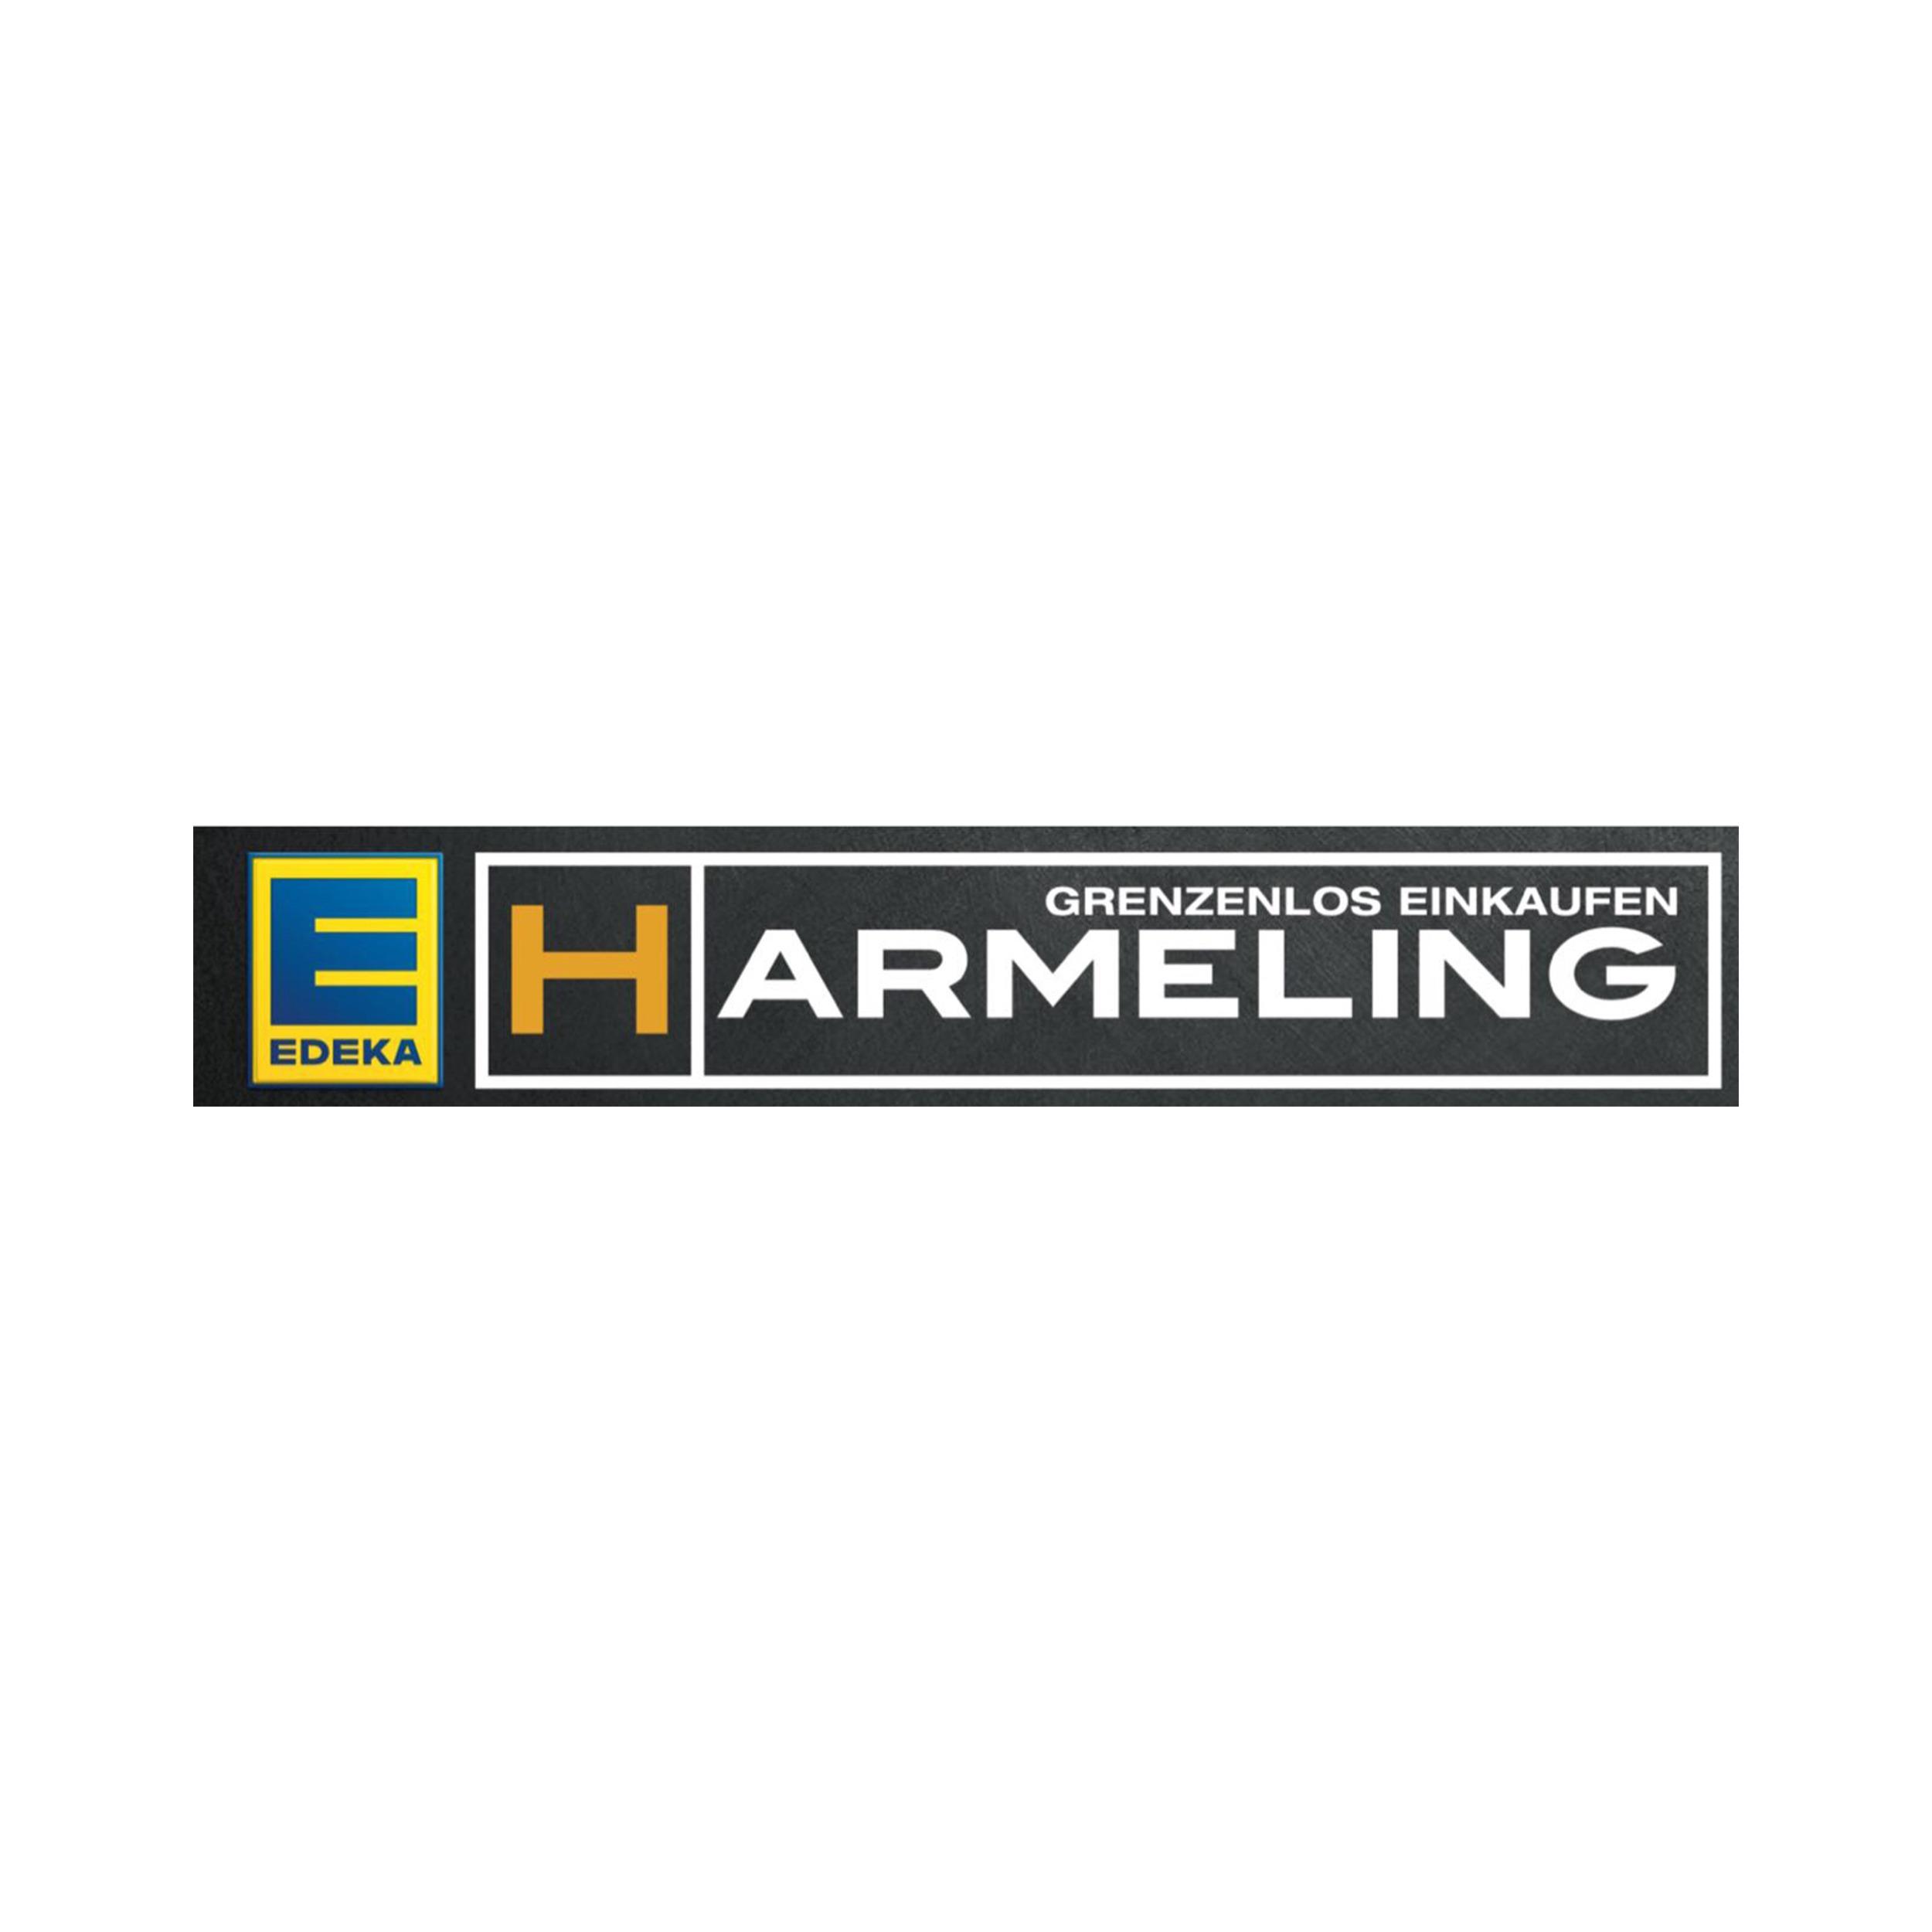 Bocholt800_Silber-Harmeling_20210811